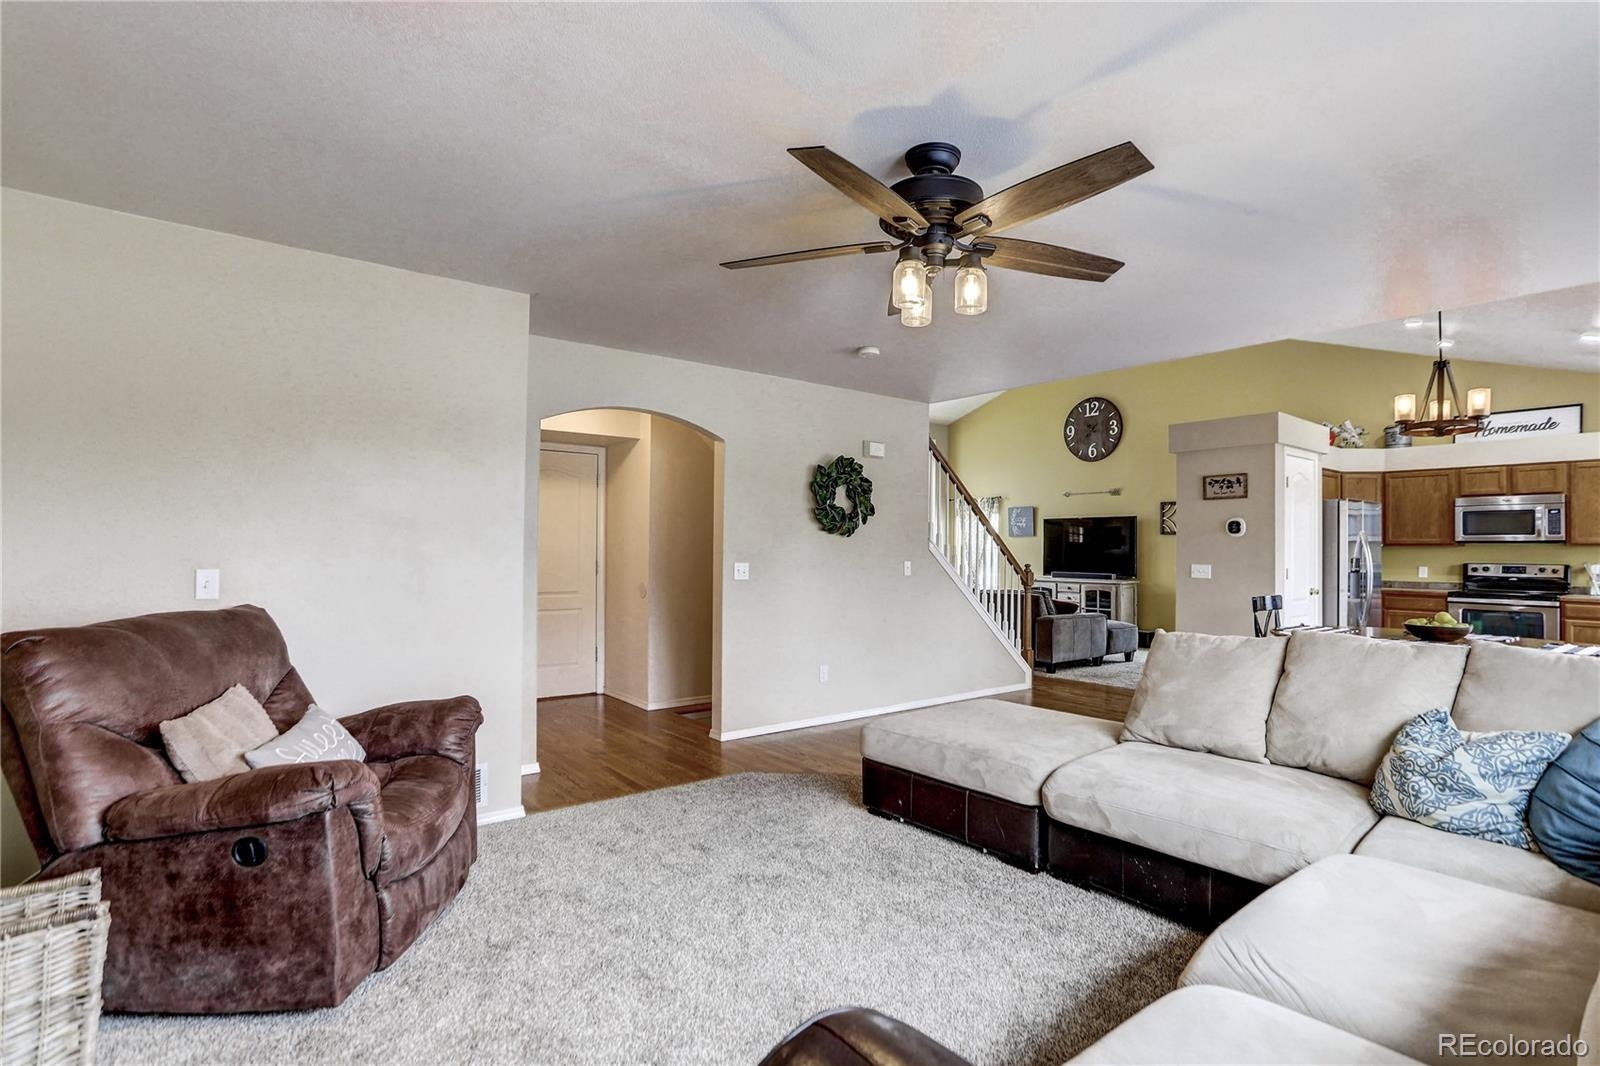 MLS# 9497145 - 11 - 4960 Squirreltail Drive, Colorado Springs, CO 80920